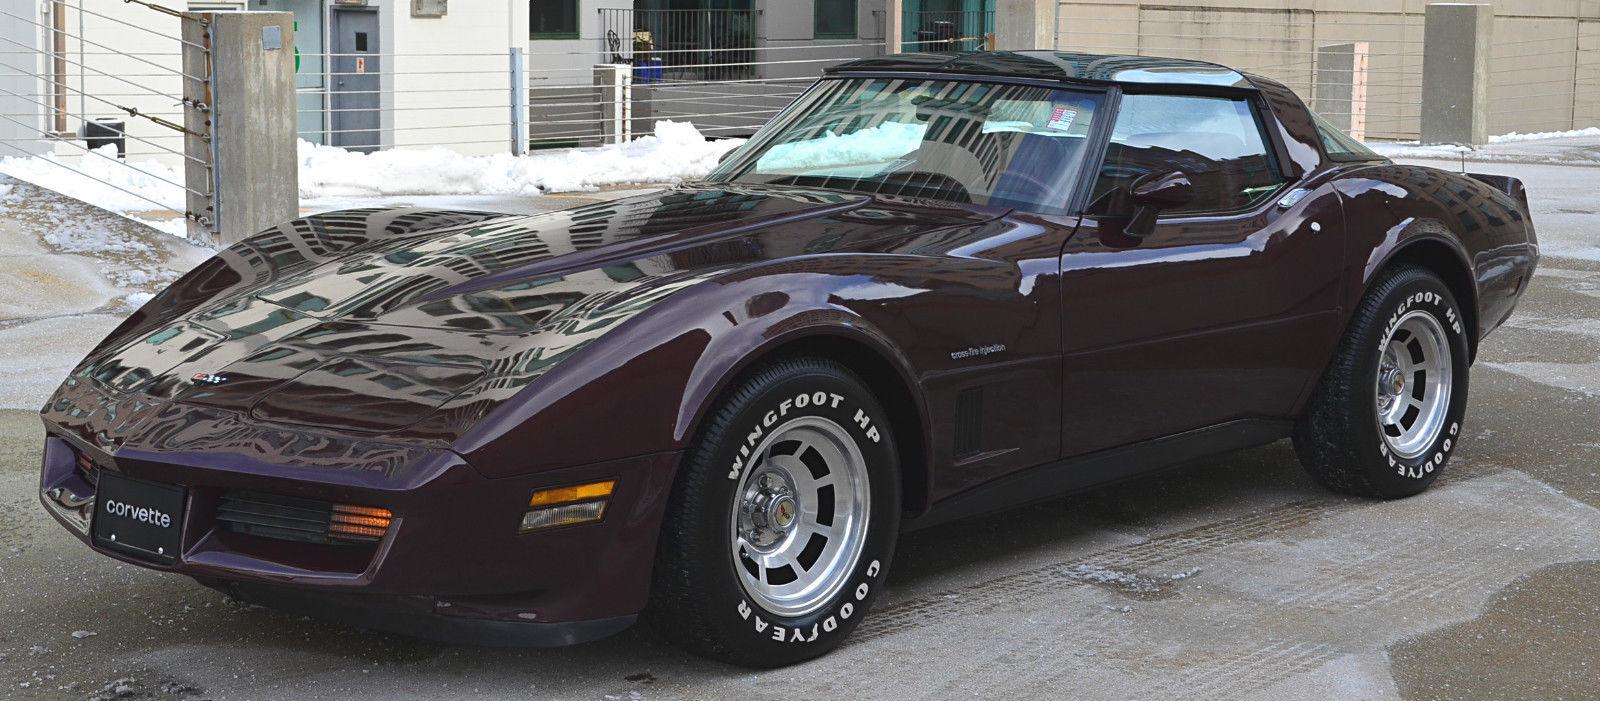 1982 Chevrolet Corvette Stingray Dark Claret Metallic 350cid 5 7l V8 Auto Chevy